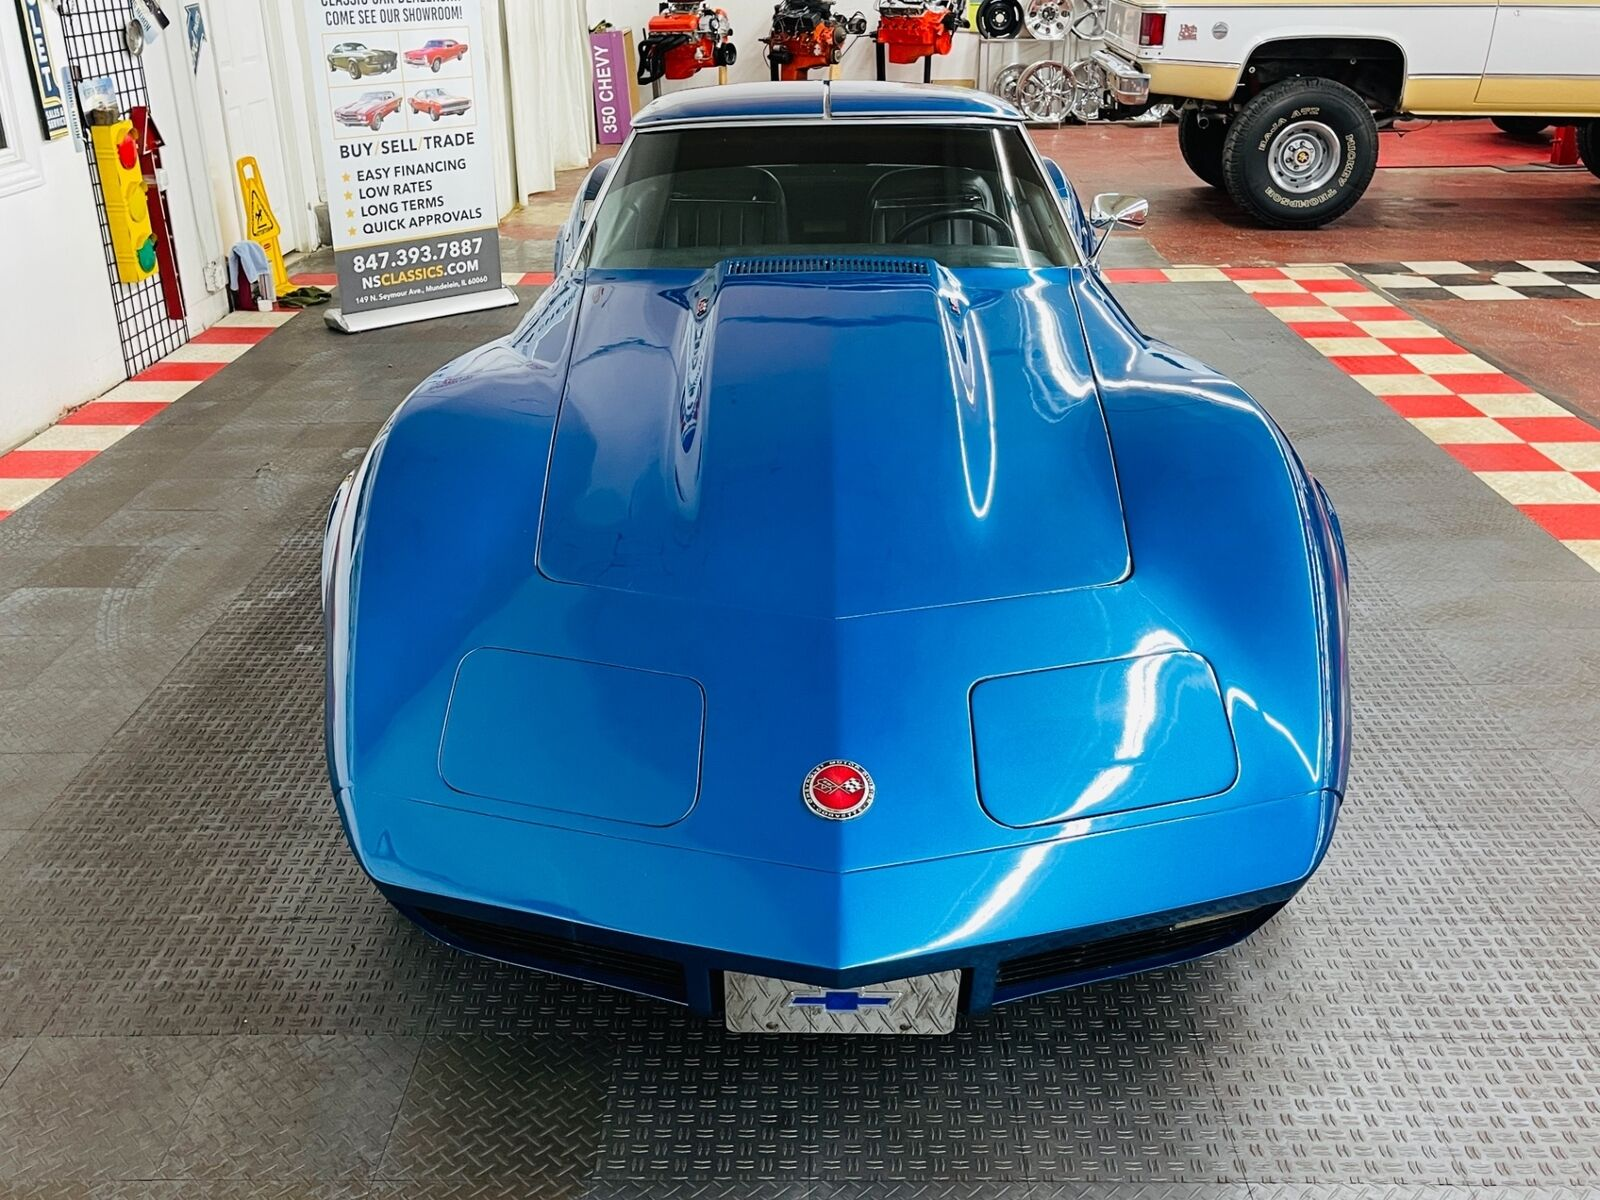 1973 Blue Chevrolet Corvette Coupe  | C3 Corvette Photo 5